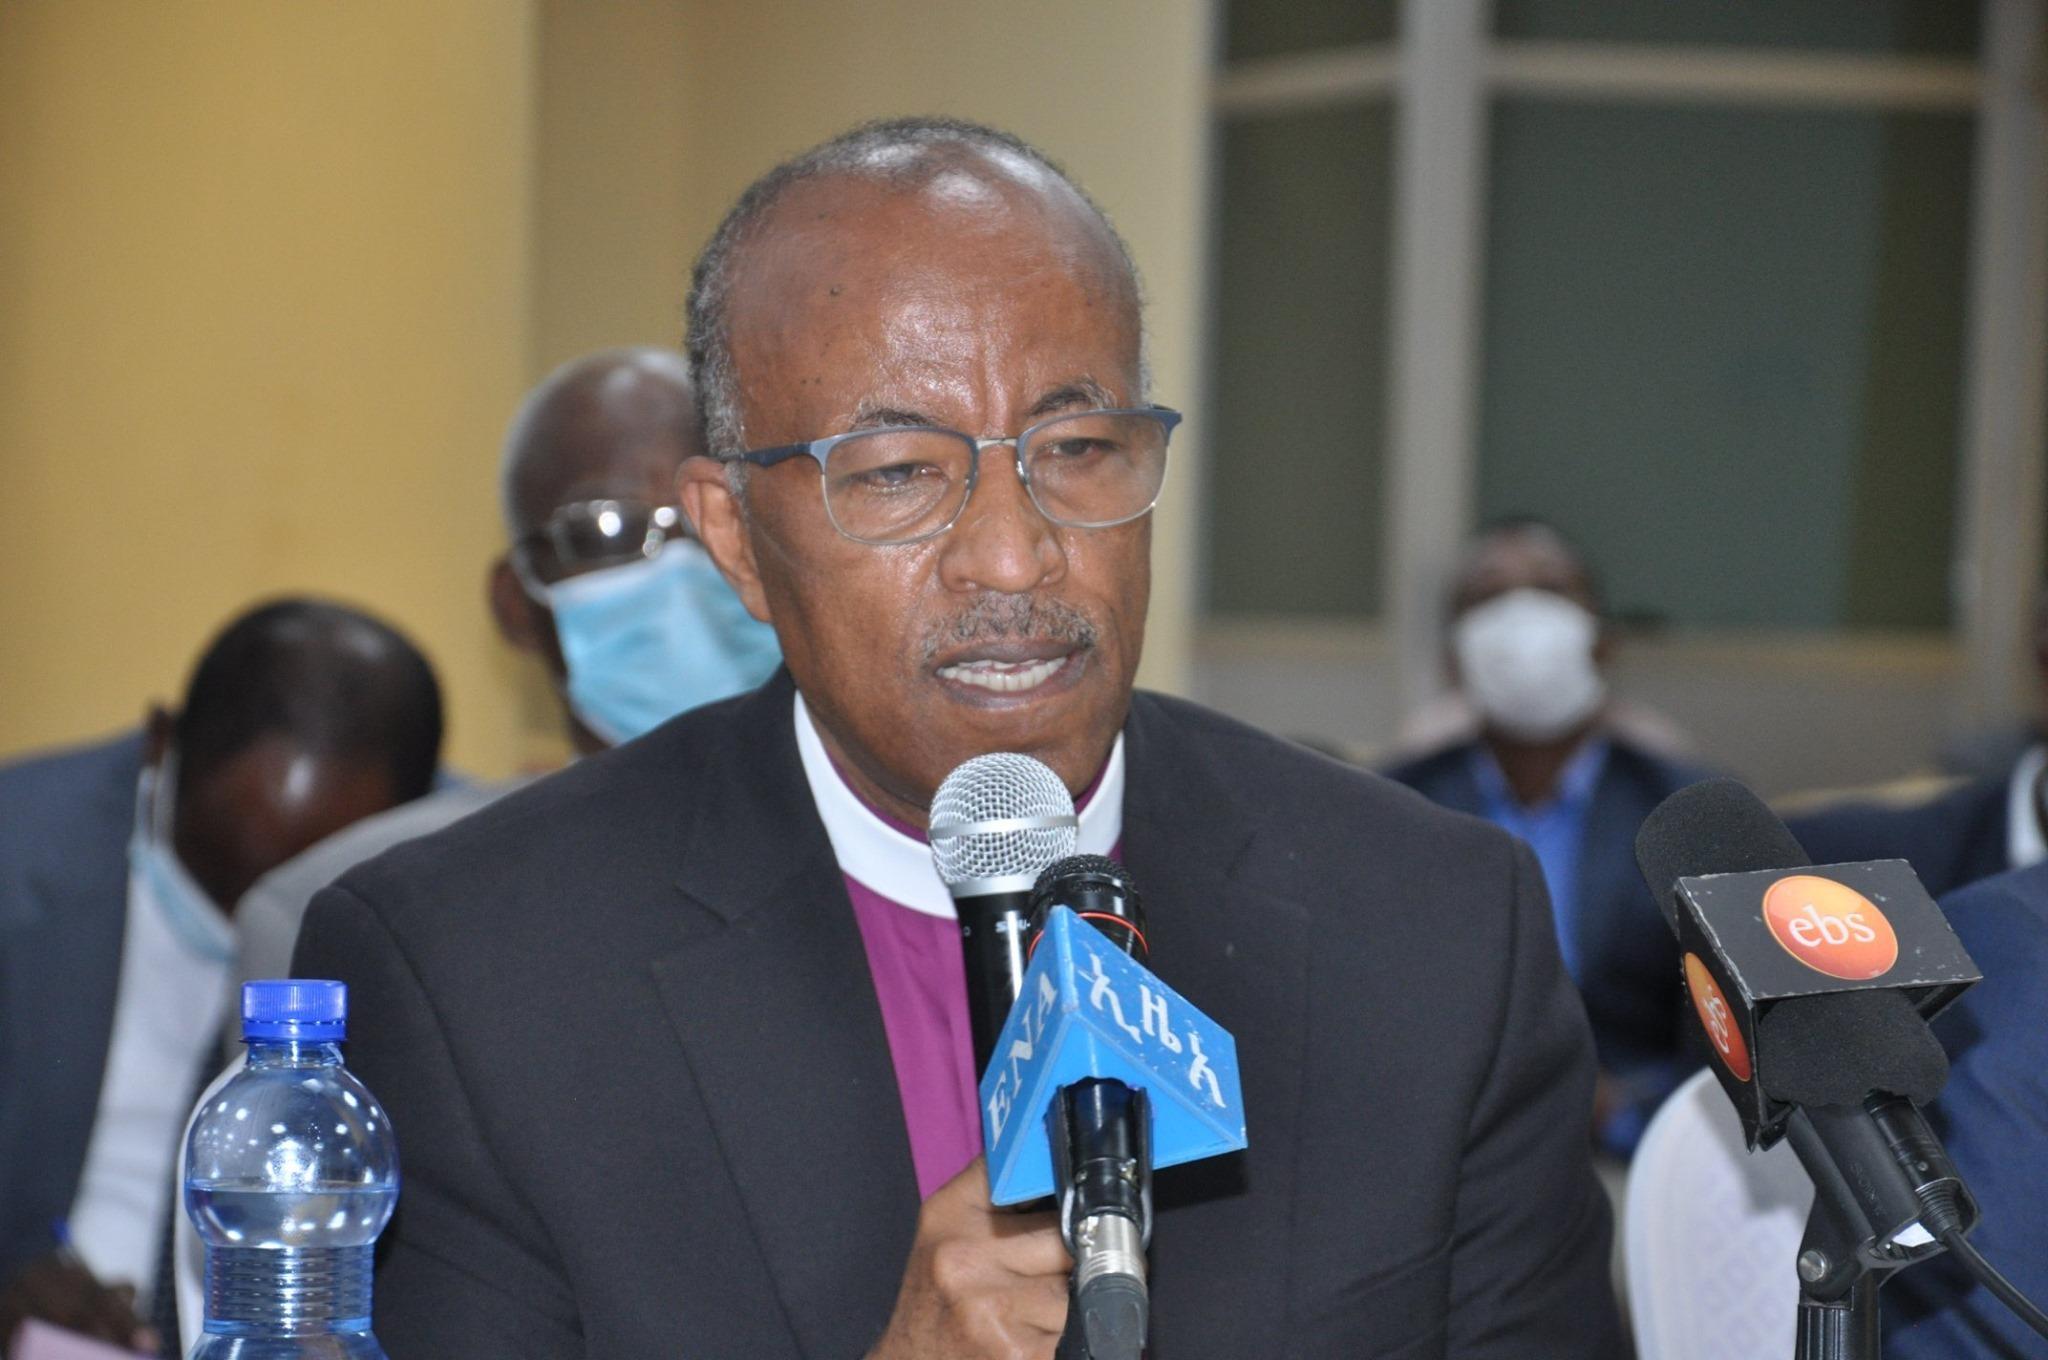 Inter-Religious Council of Ethiopia